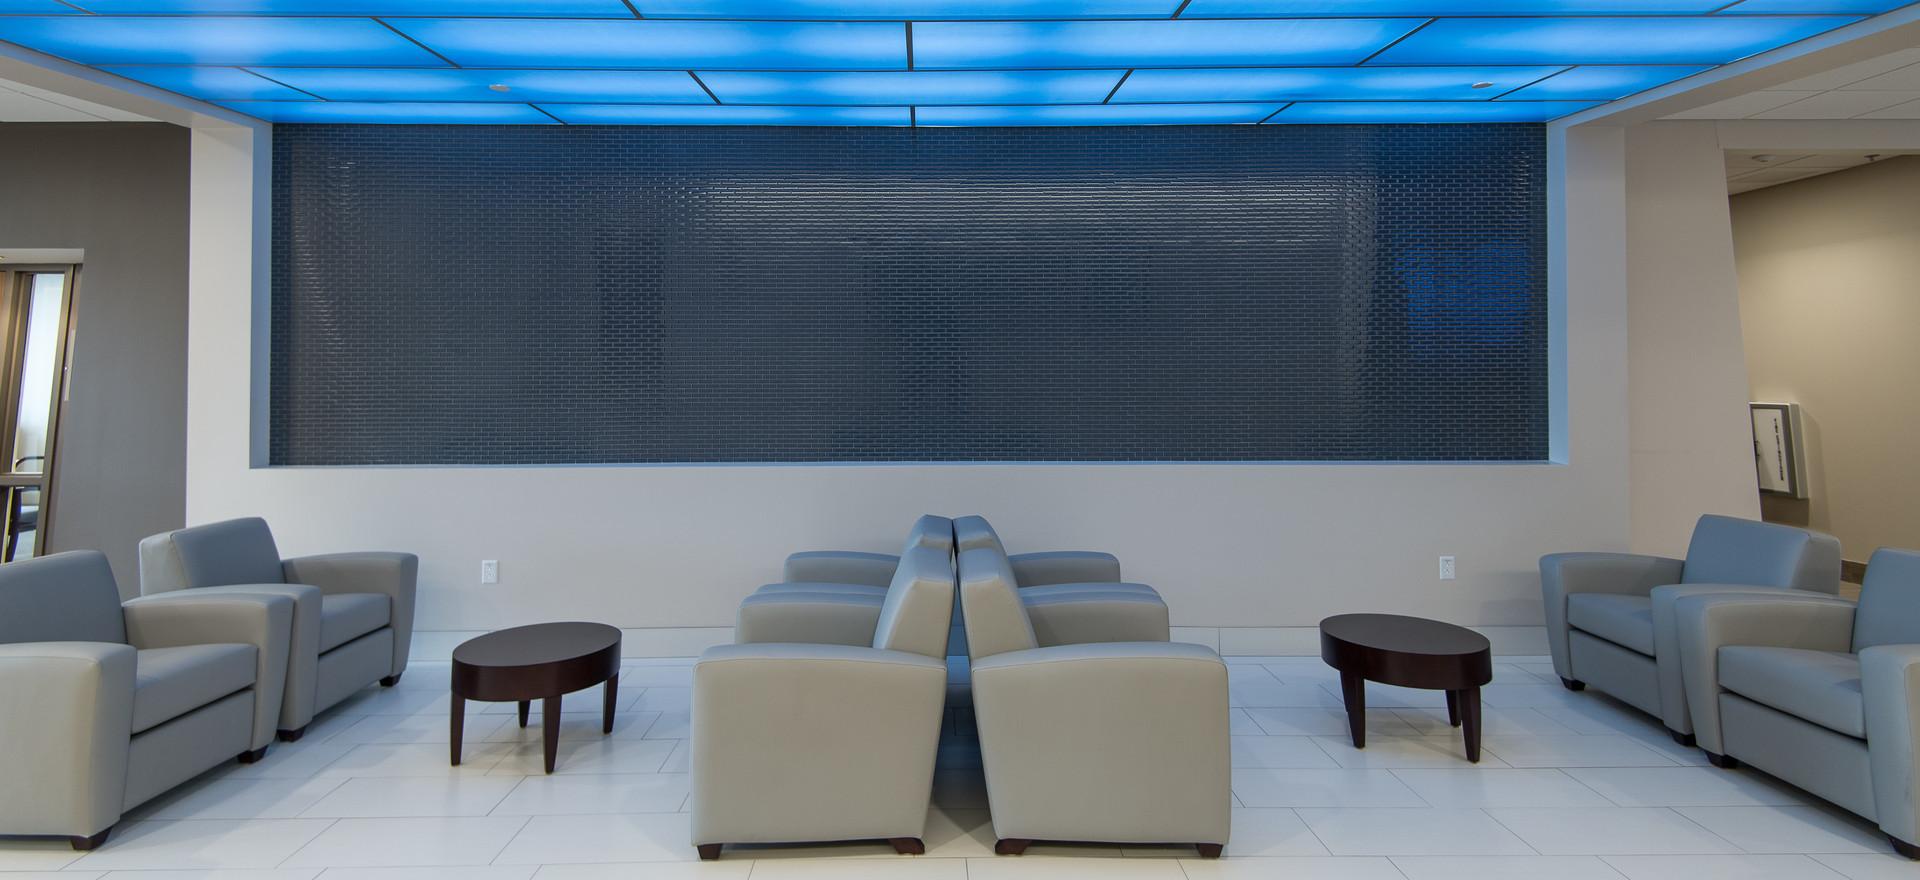 Medical Office Building Lobby Lighting